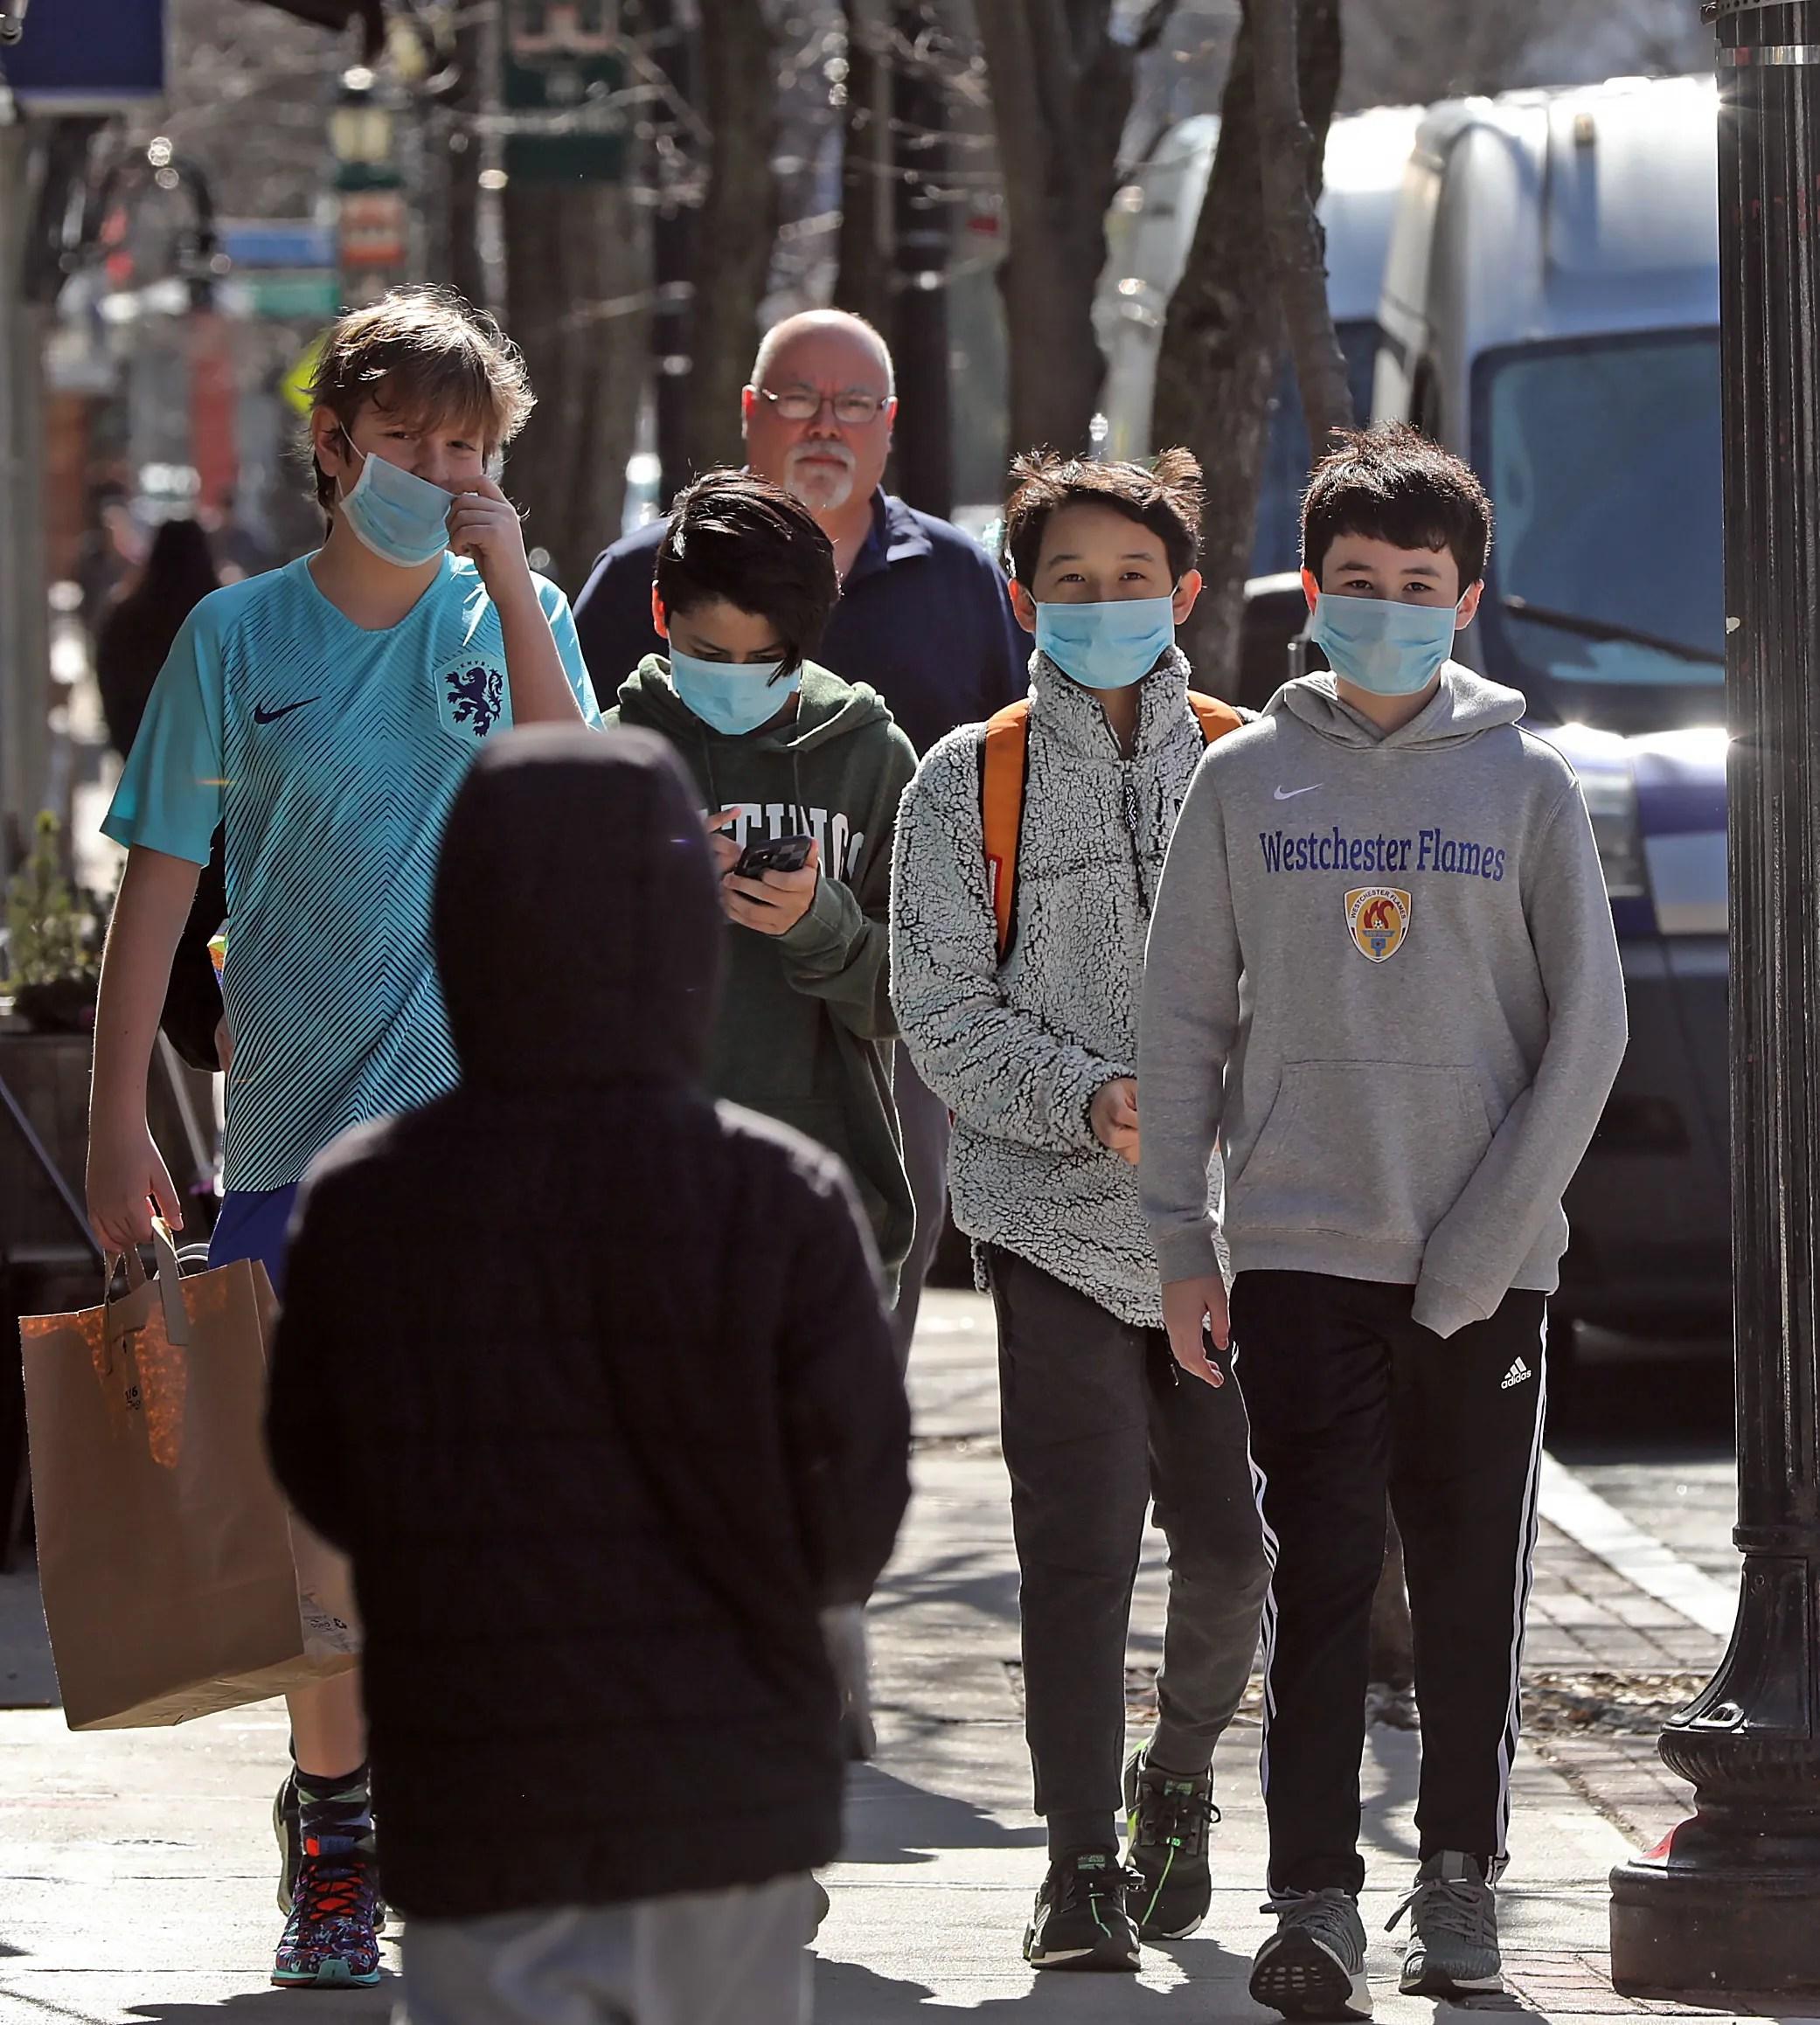 Conduent is tracking coronavirus in NYC despite past